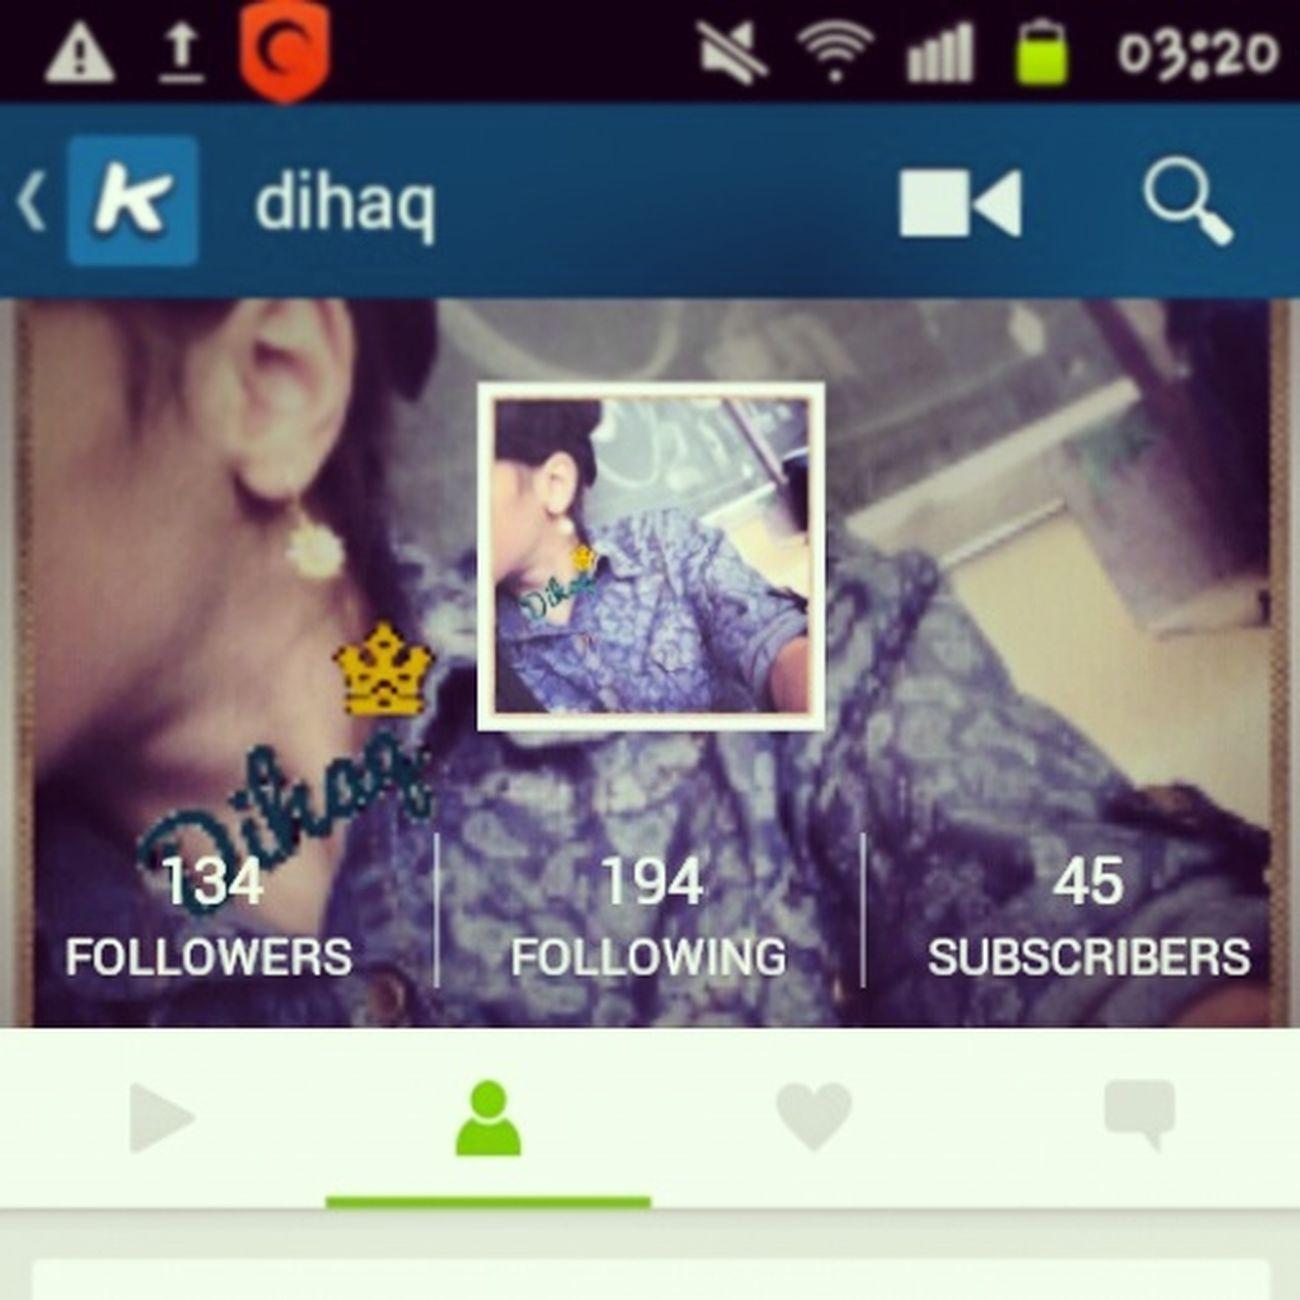 Follow me at keek : Dihaq Keek Me Follow My Keek Please :) ❤ Keek Follow Me